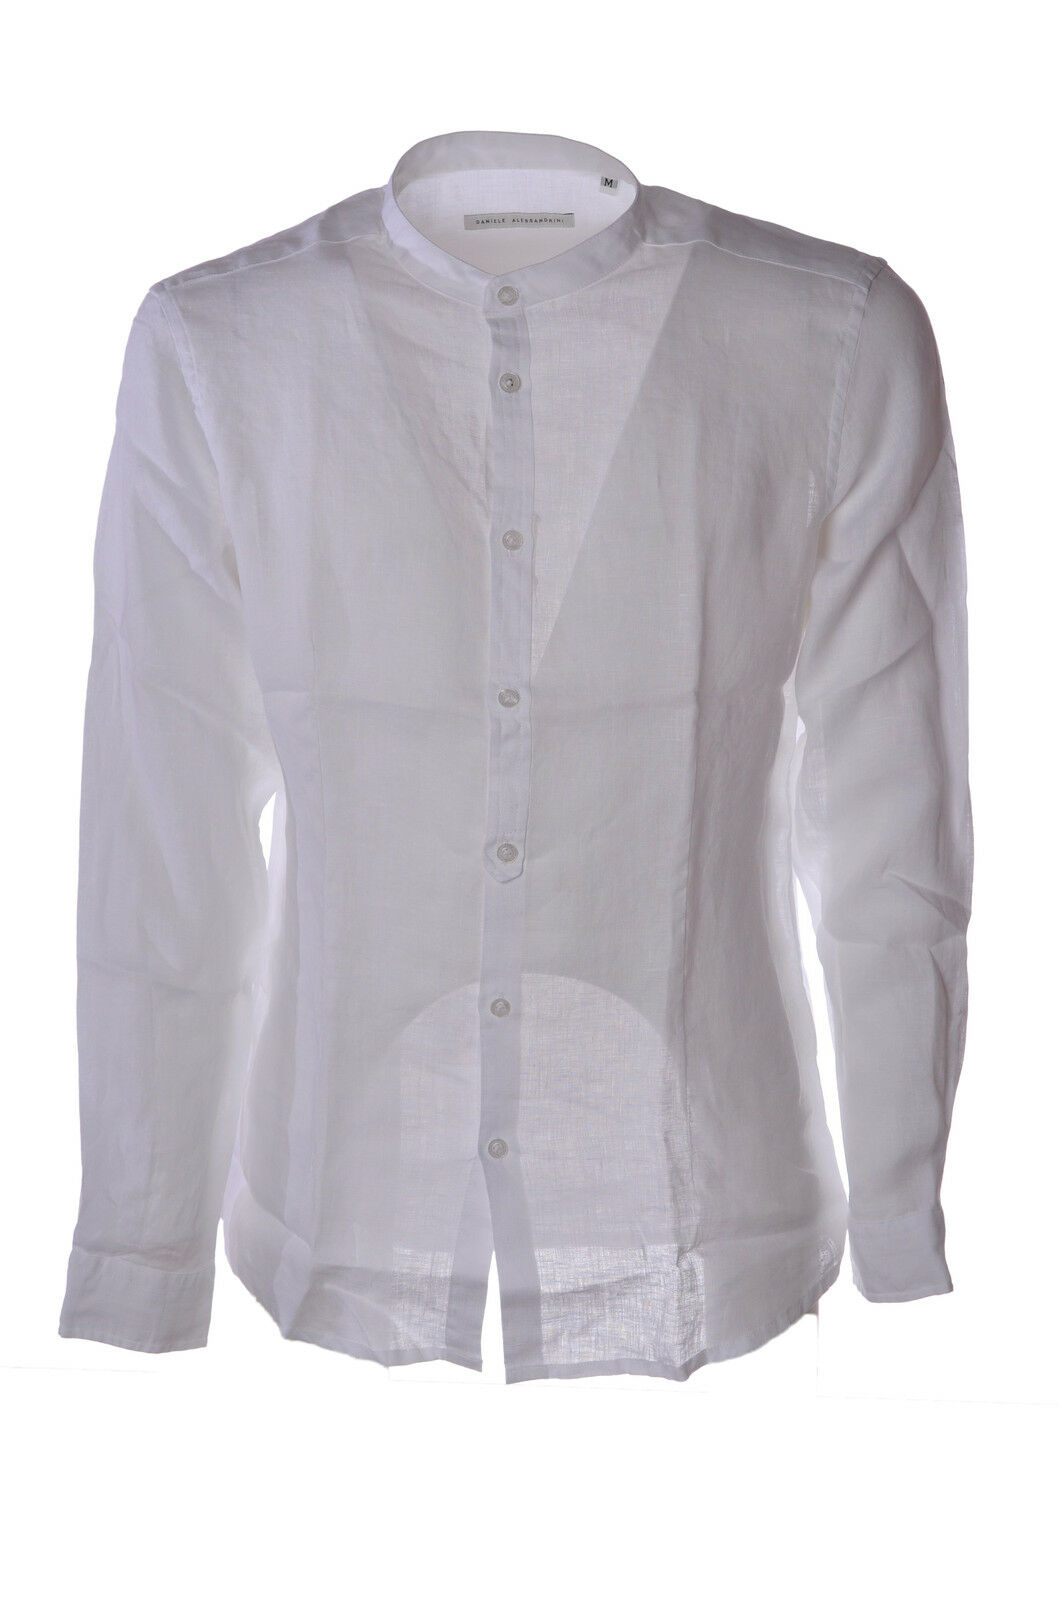 Daniele Alessandrini  -  Shirts - Male - Weiß - 3124513A183626